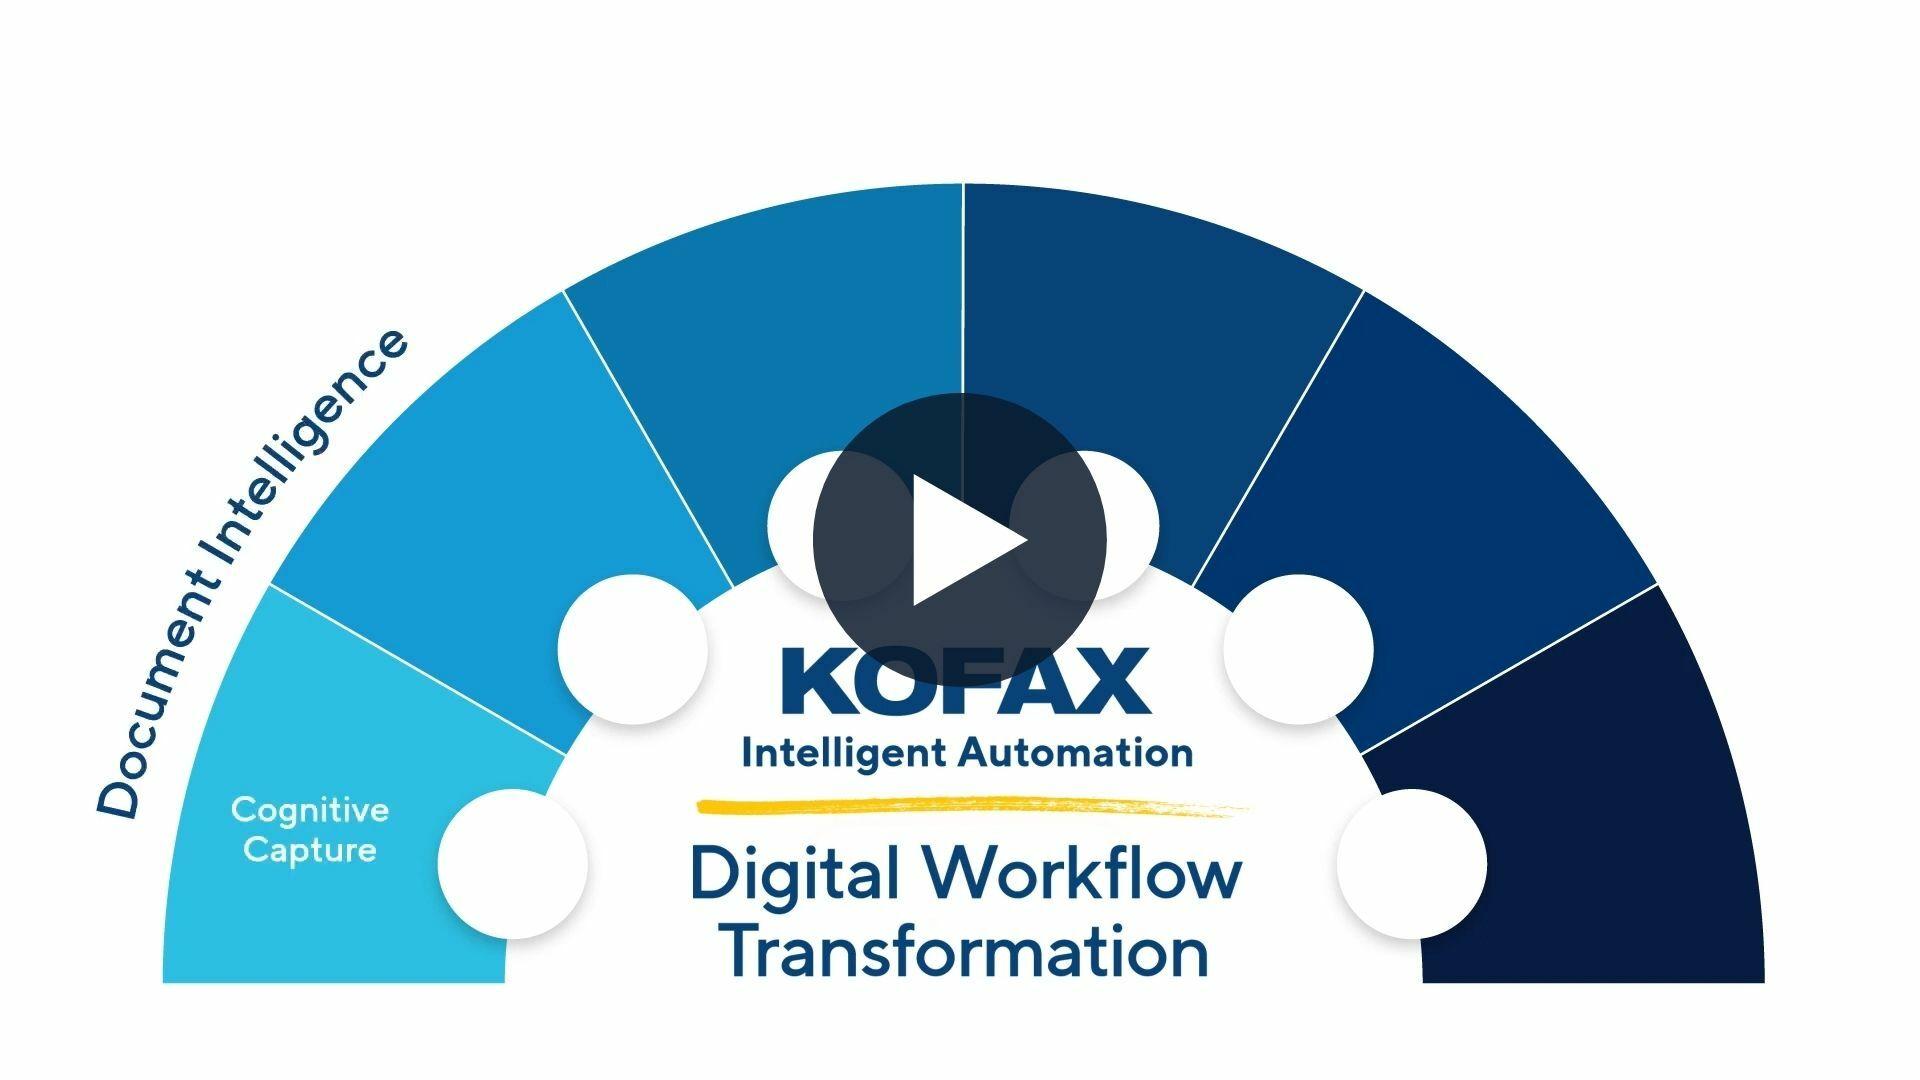 Digital Workflow Transformation with Kofax Intelligent Automation